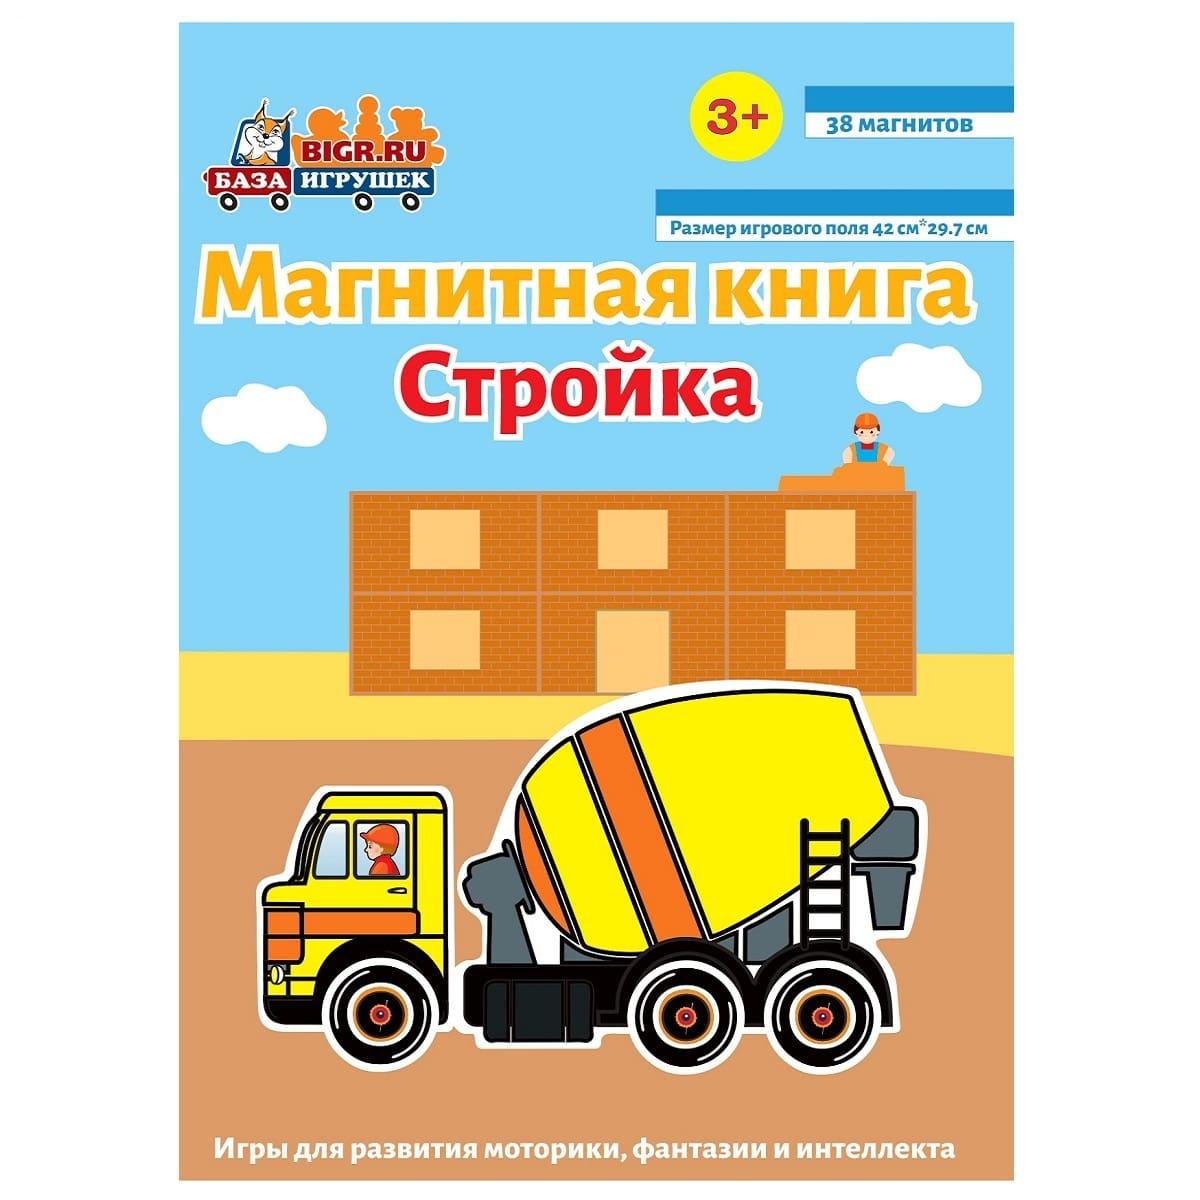 Магнитная книга База игрушек Стройка.